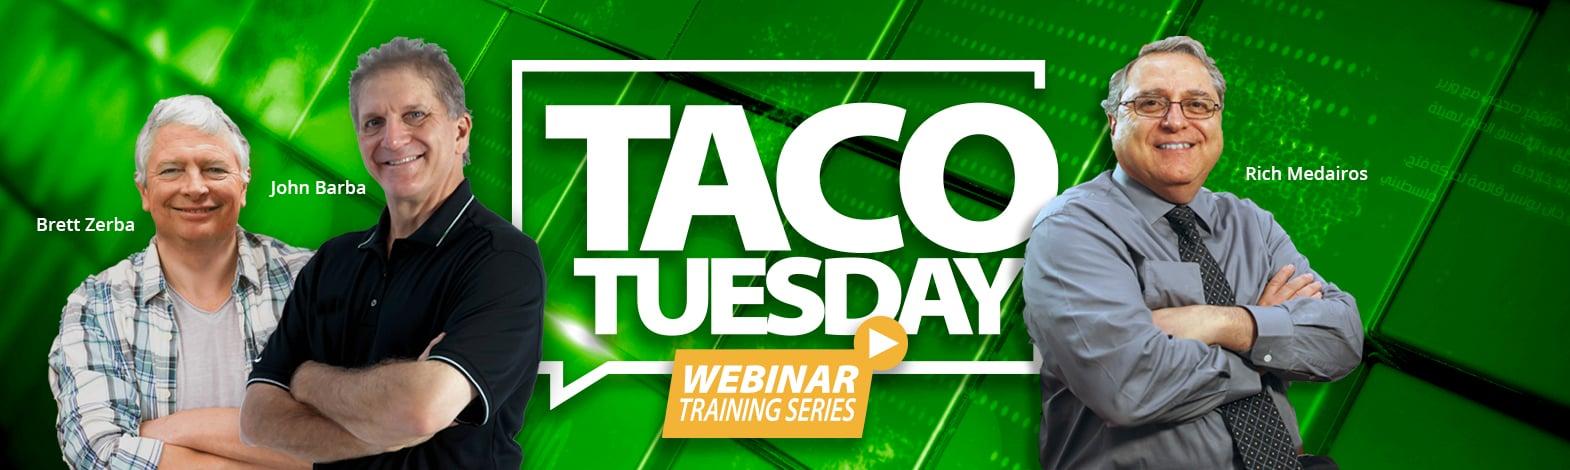 Taco-Tuesday_banner-copy